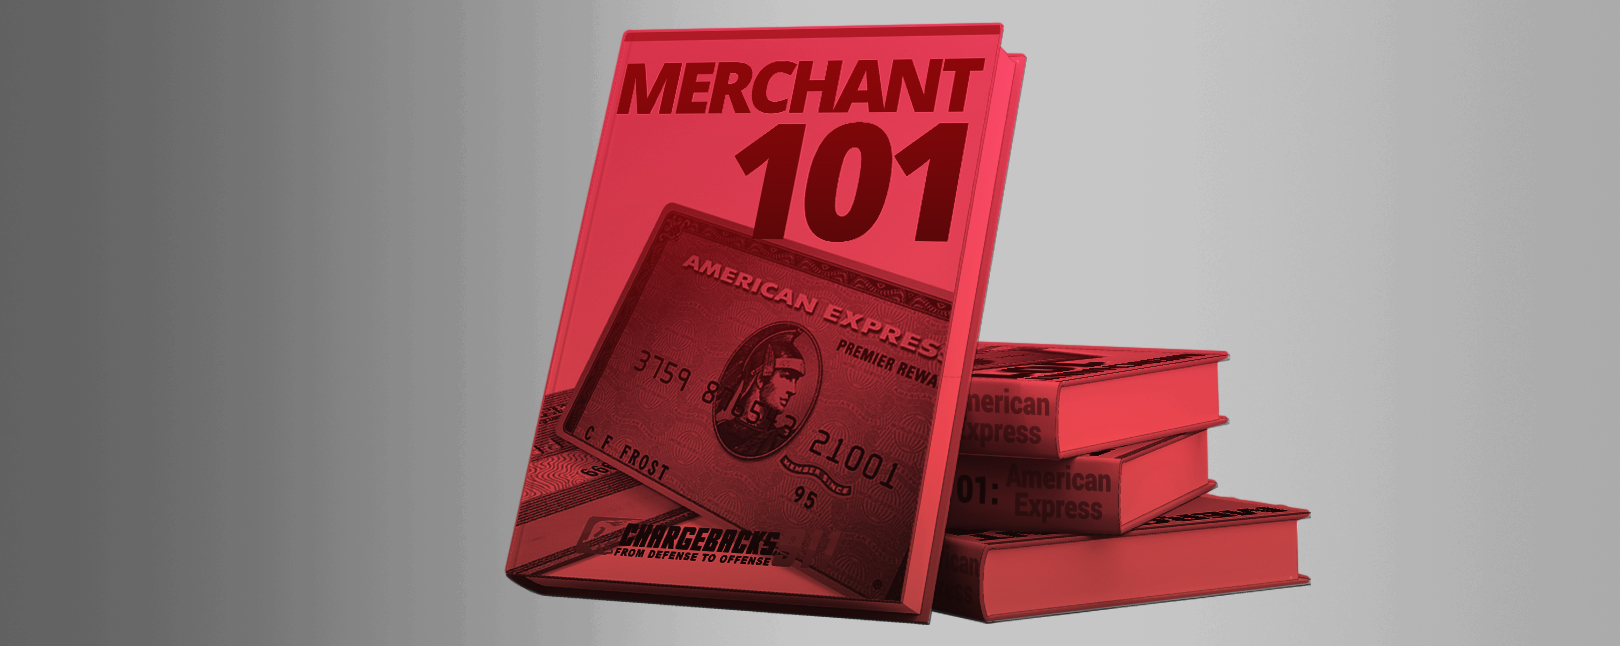 merchant-101-amex